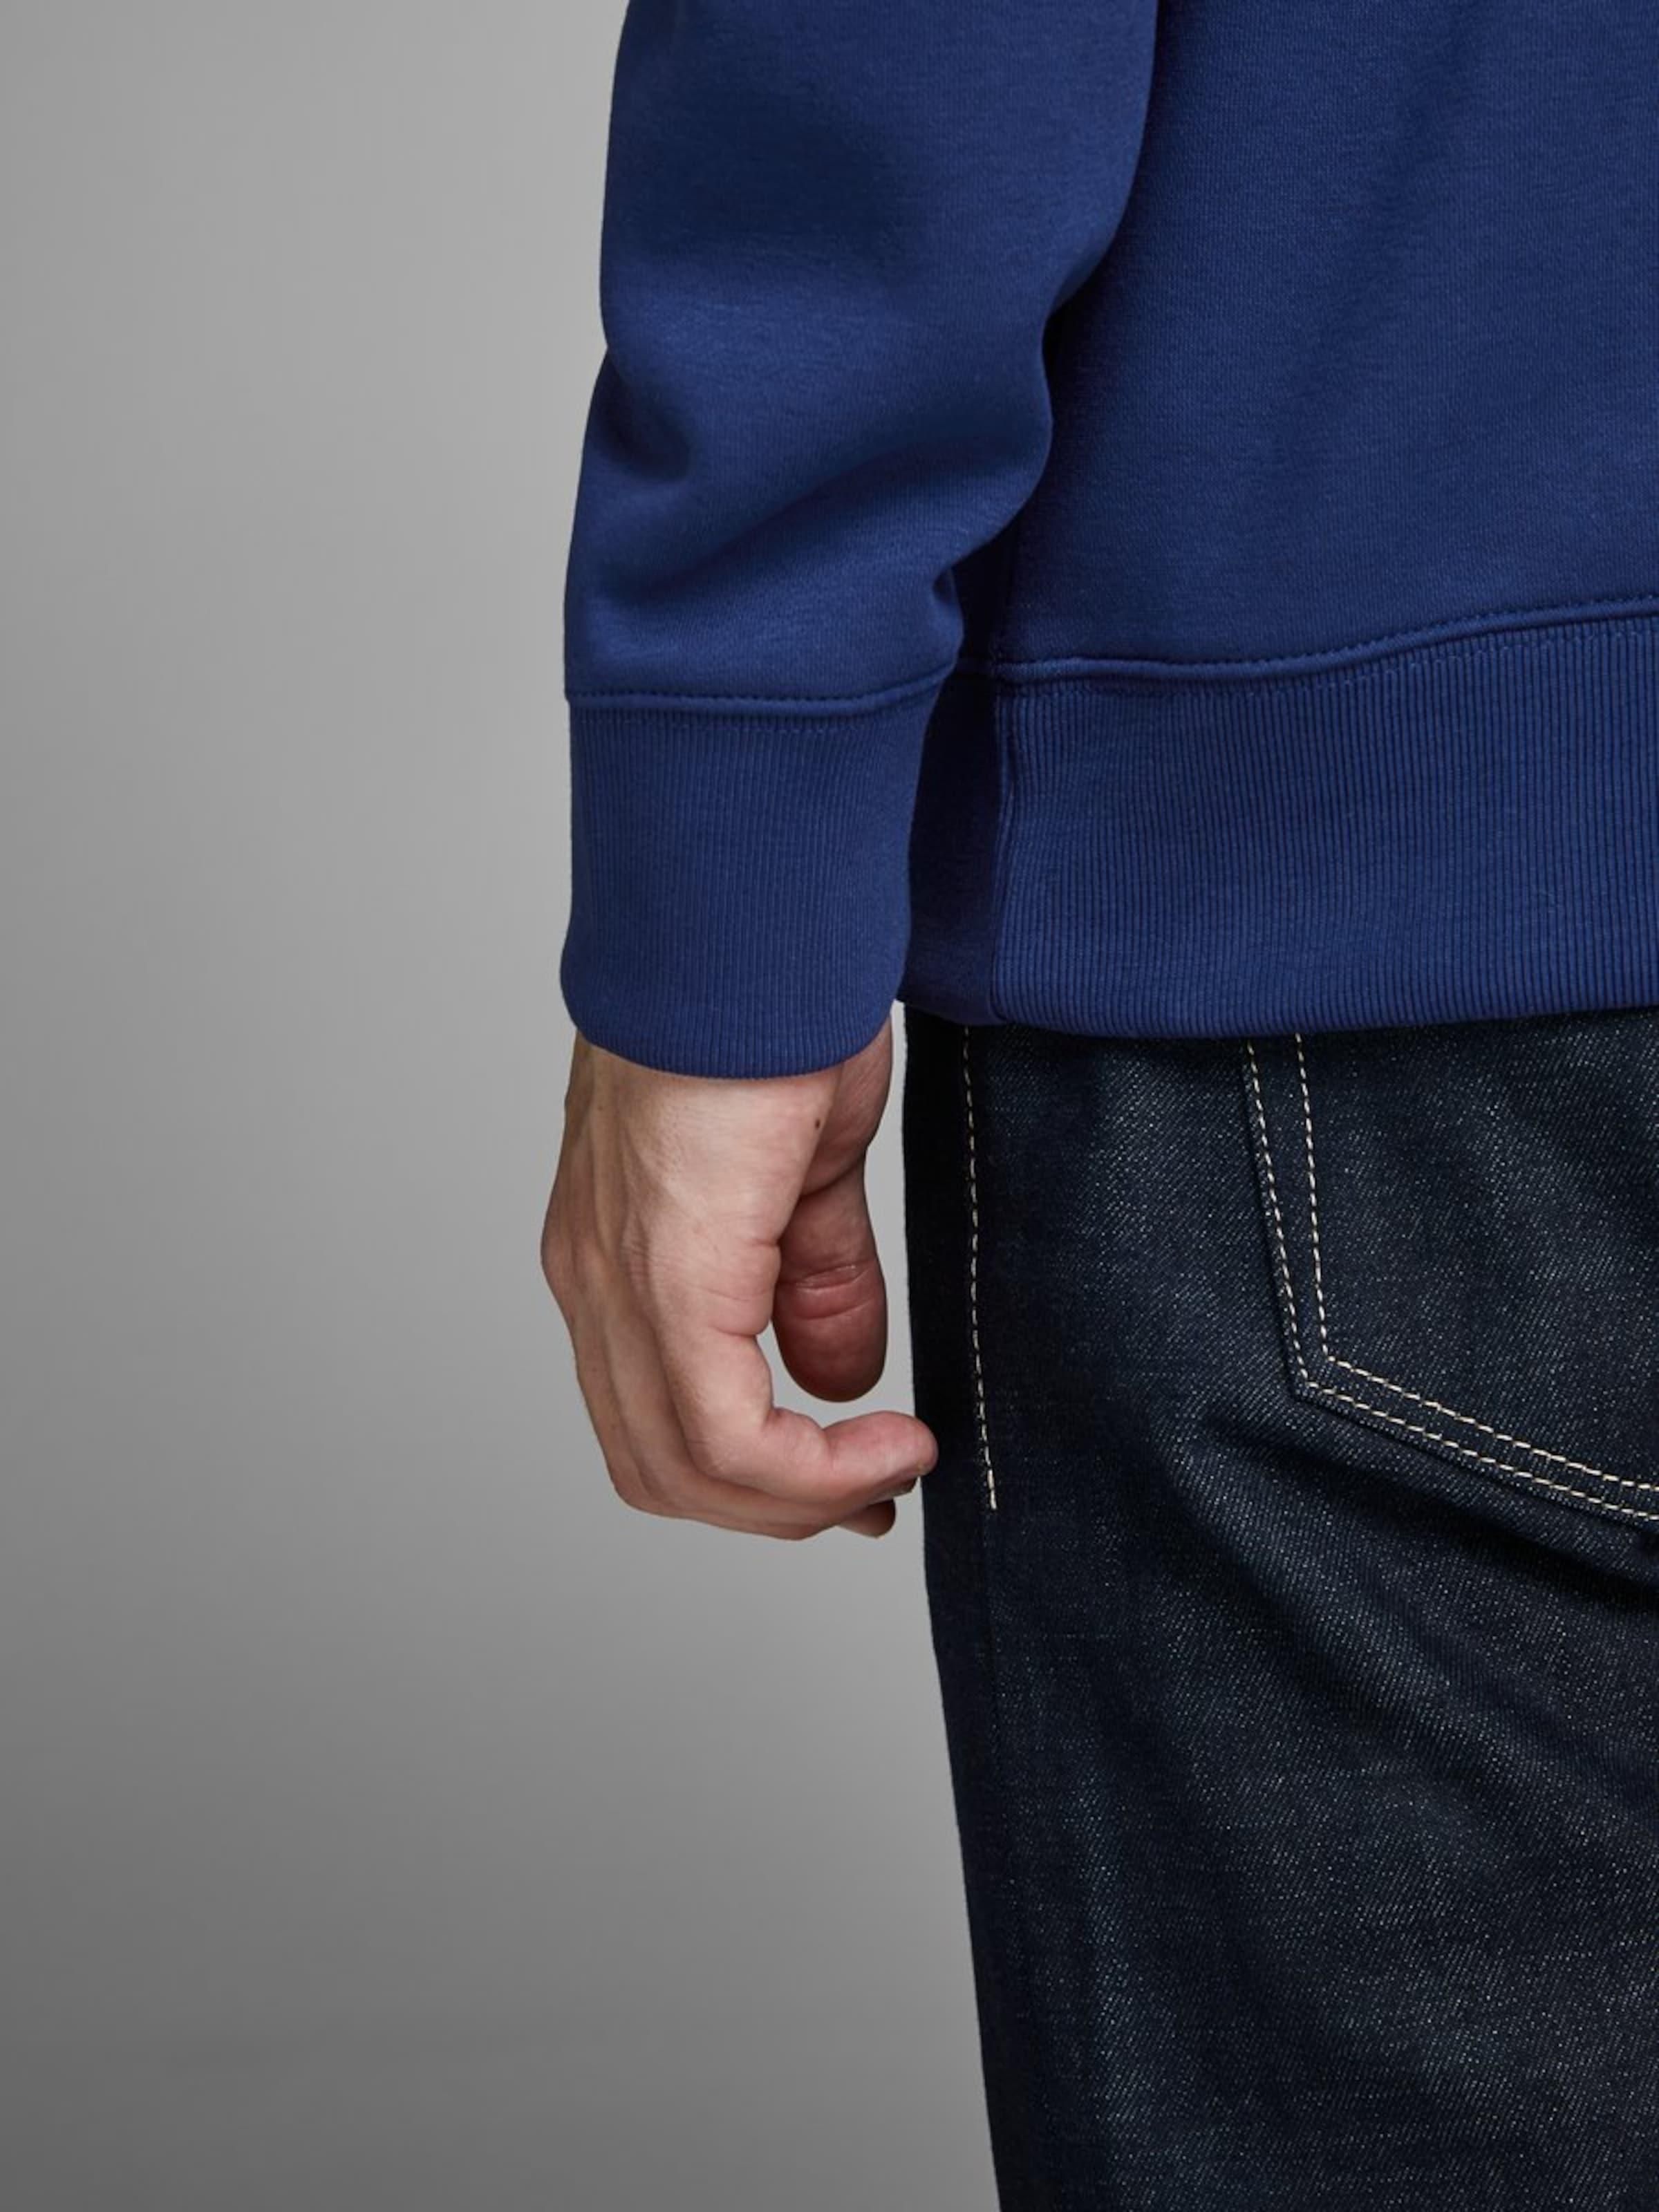 Dunkelblau 'soft' Sweatshirt Jackamp; In Jones 5RL4jA